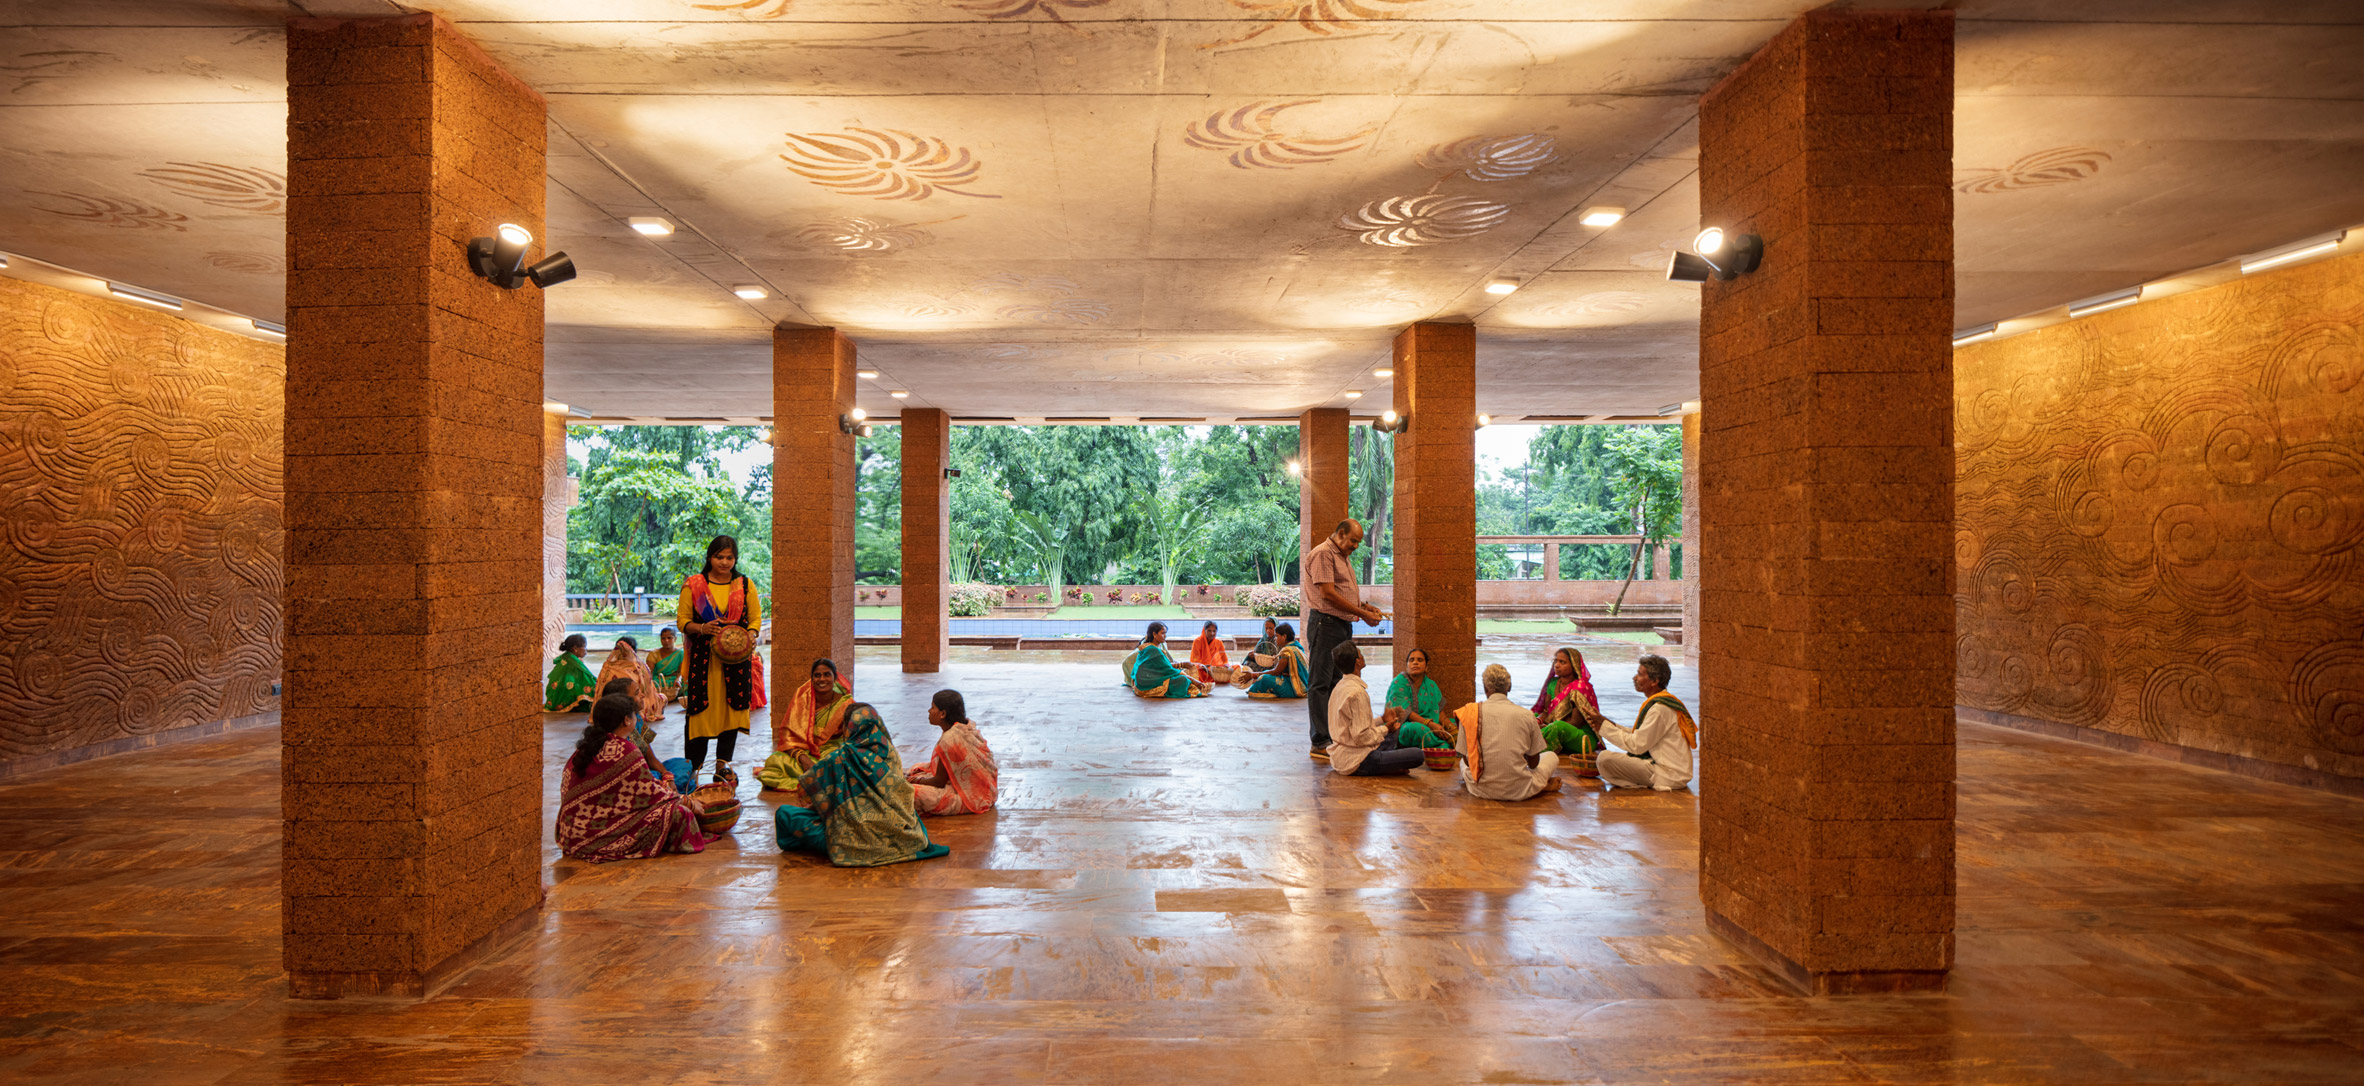 Krushi Bhawanin by Studio Lotus